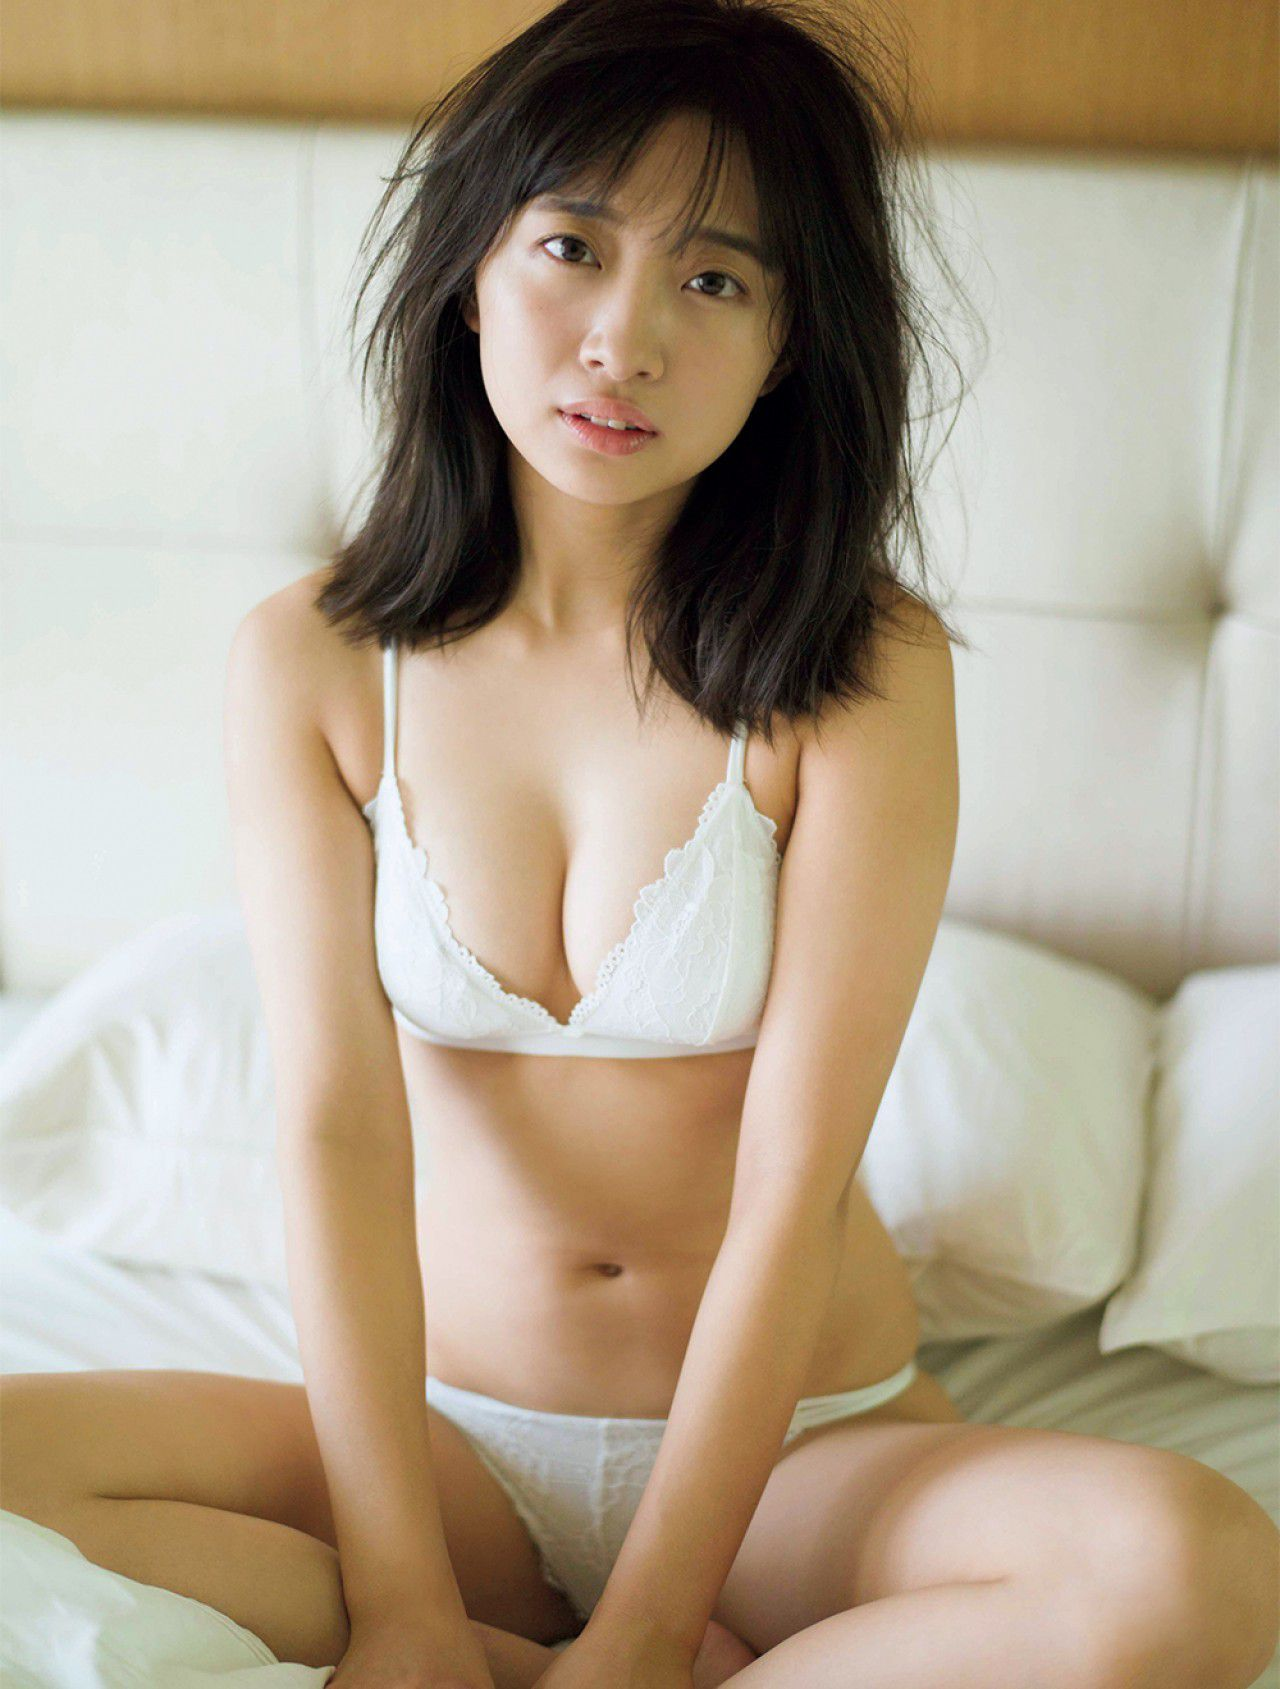 VOL.164 [FRIDAY]阳光沙滩美女:渡边幸爱(渡邉幸愛)超高清写真套图(7P)